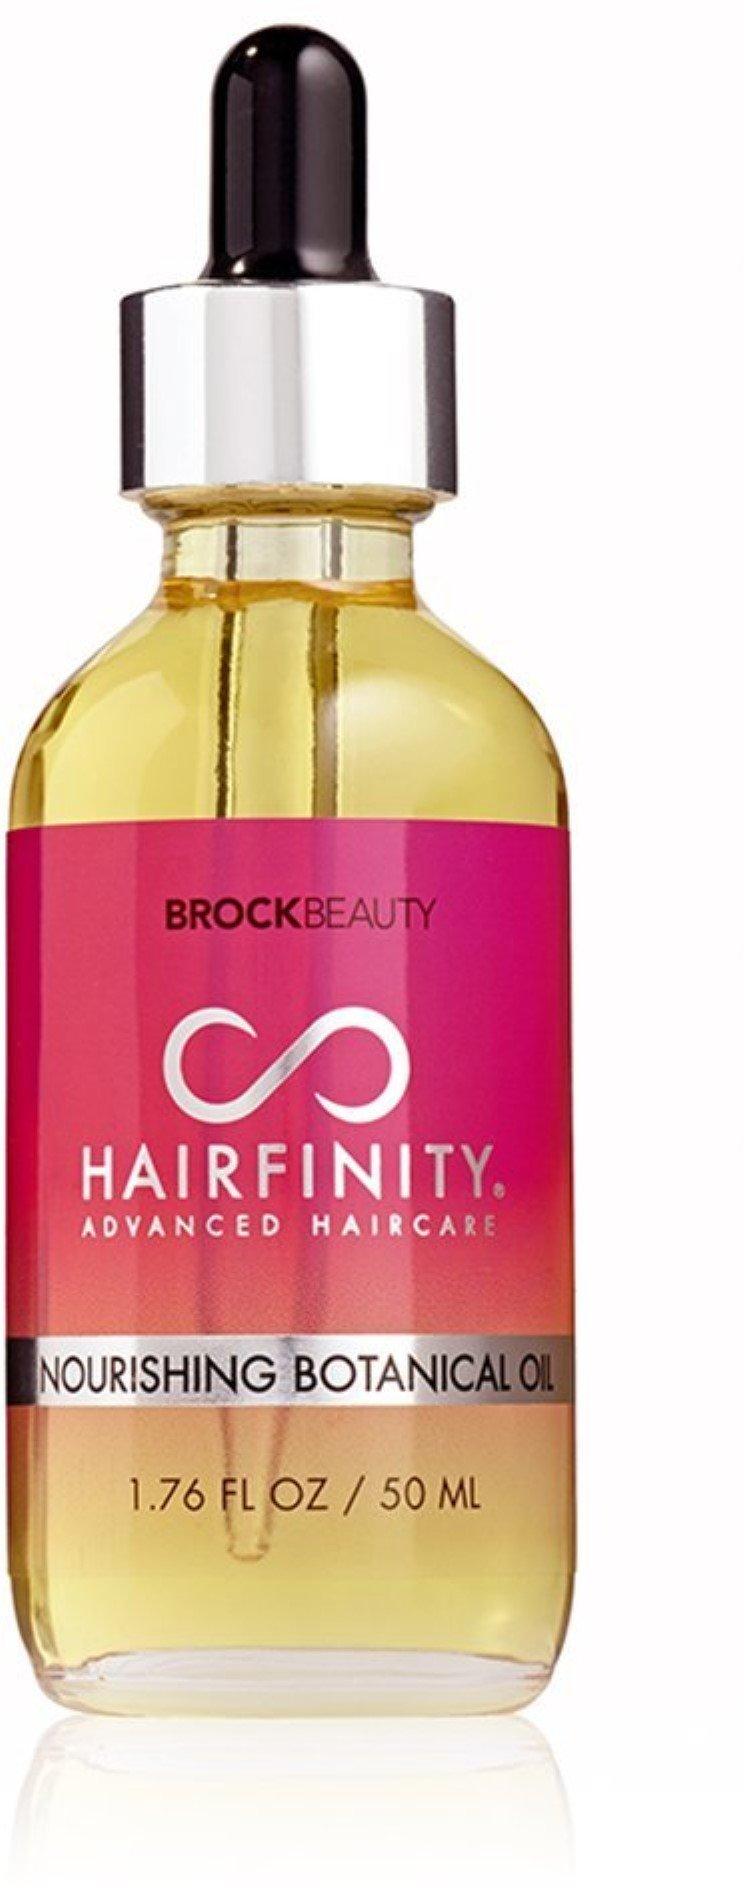 Hairfinity Nourishing Botanical Oil 100% Naturally Derived Ingredients & Essential Oils - Reduce Hair Breakage + Increase Shine & Elasticity 1.76 oz